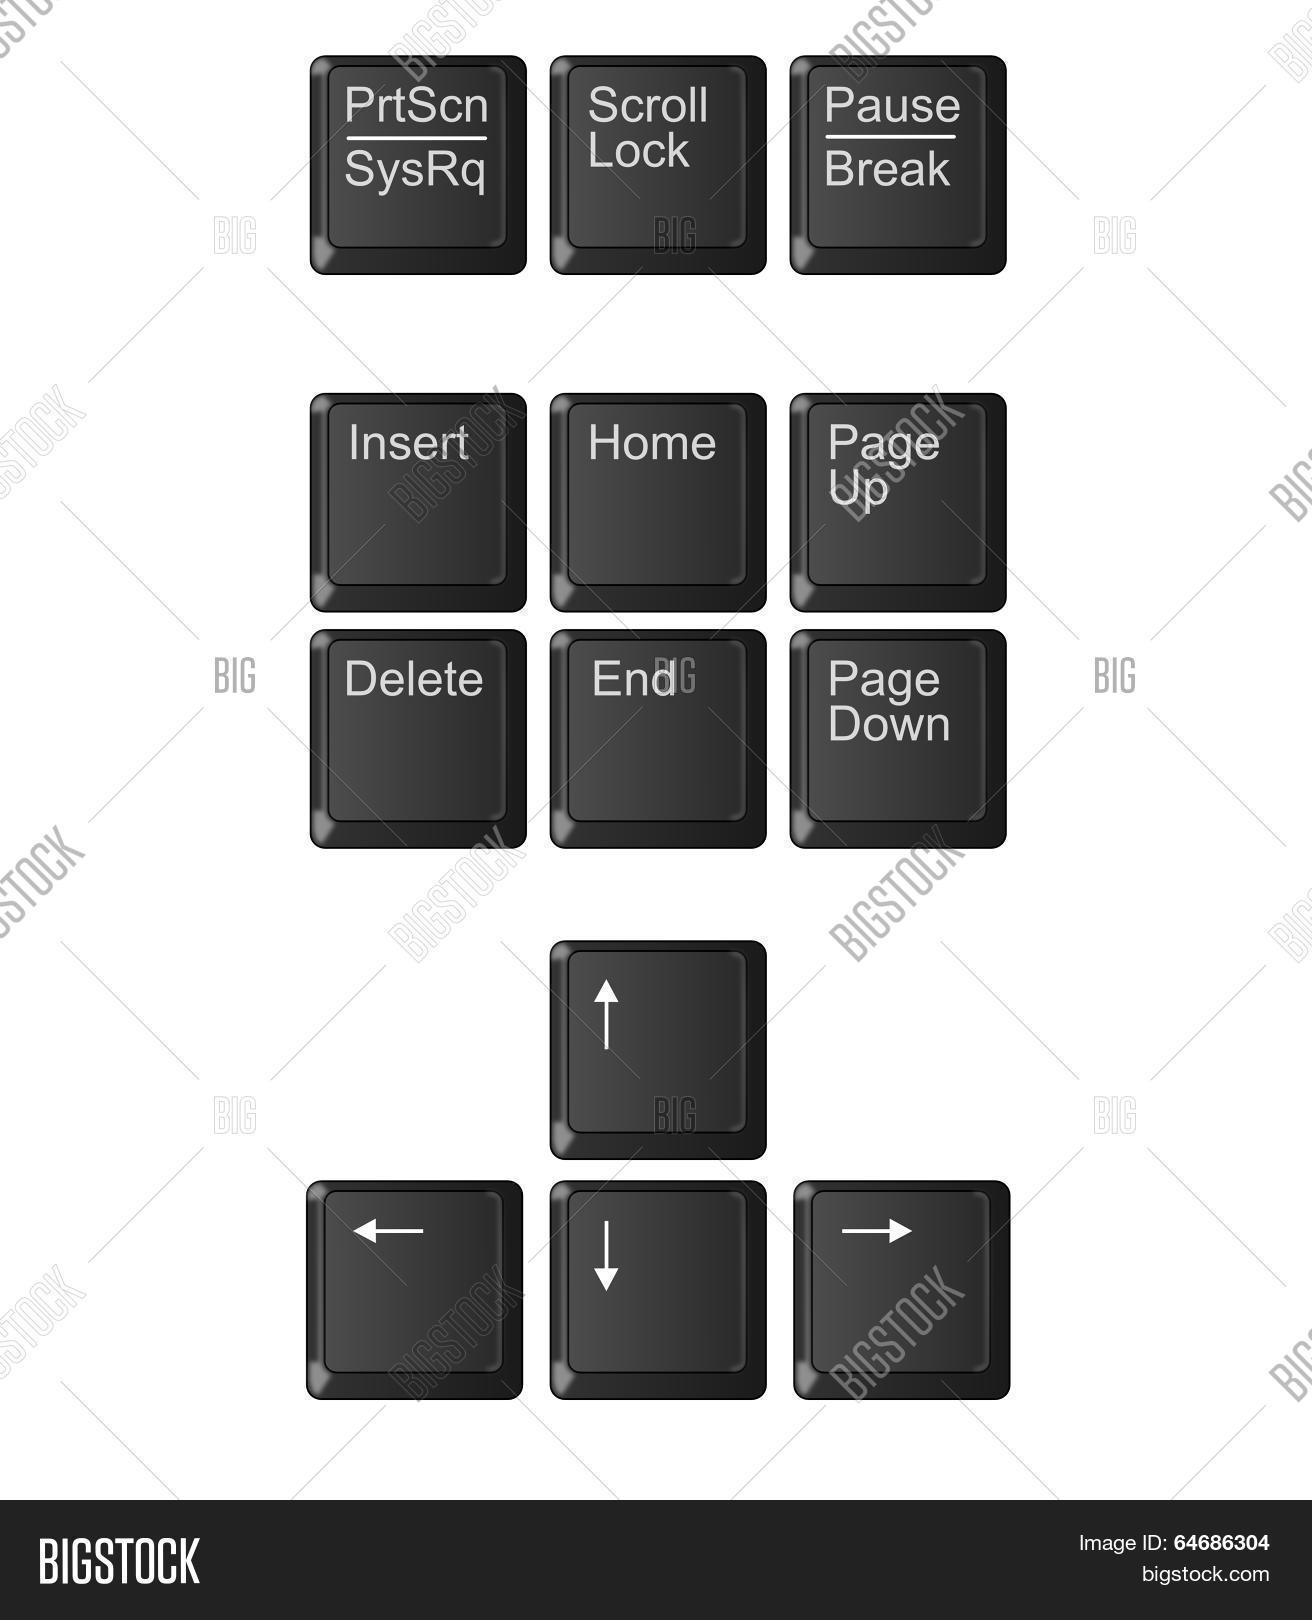 Computer Keyboard Image & Photo (Free Trial) | Bigstock